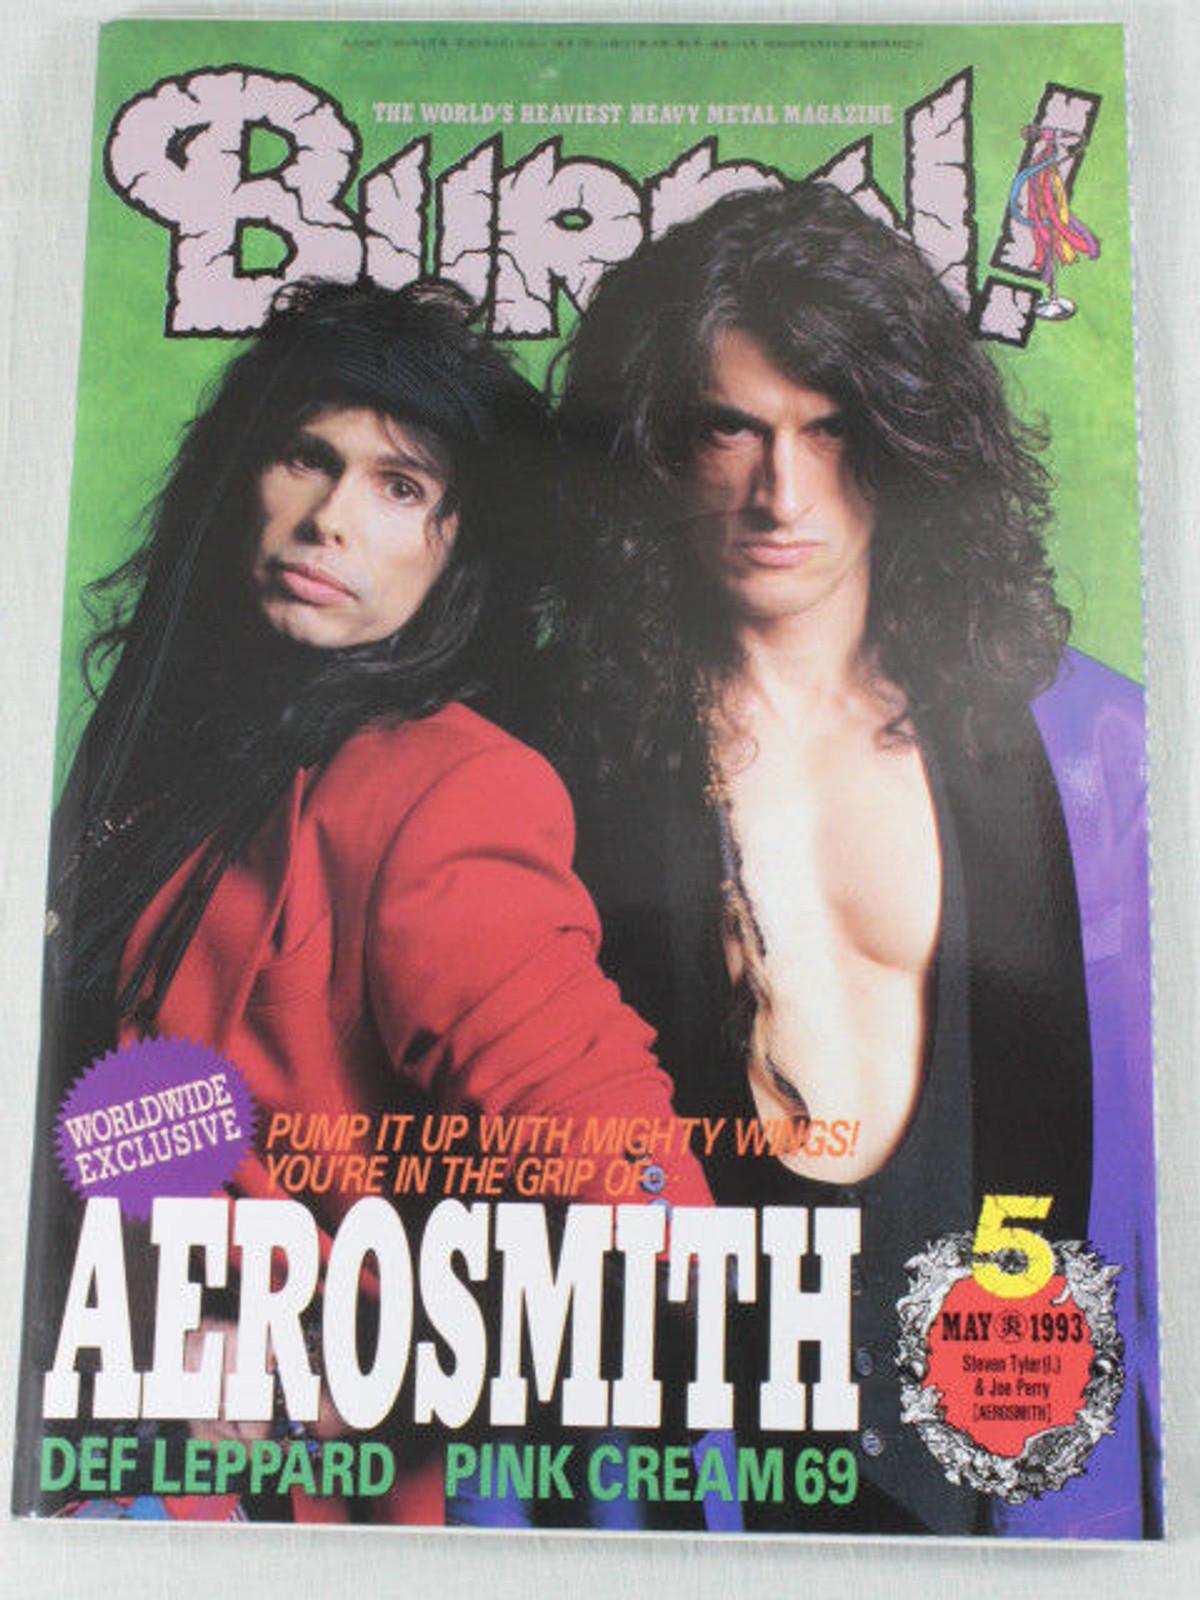 1993/05 BURRN! Japan Rock Magazine AEROSMITH/DEF LEPPARD/BON JOVI/ARCADE